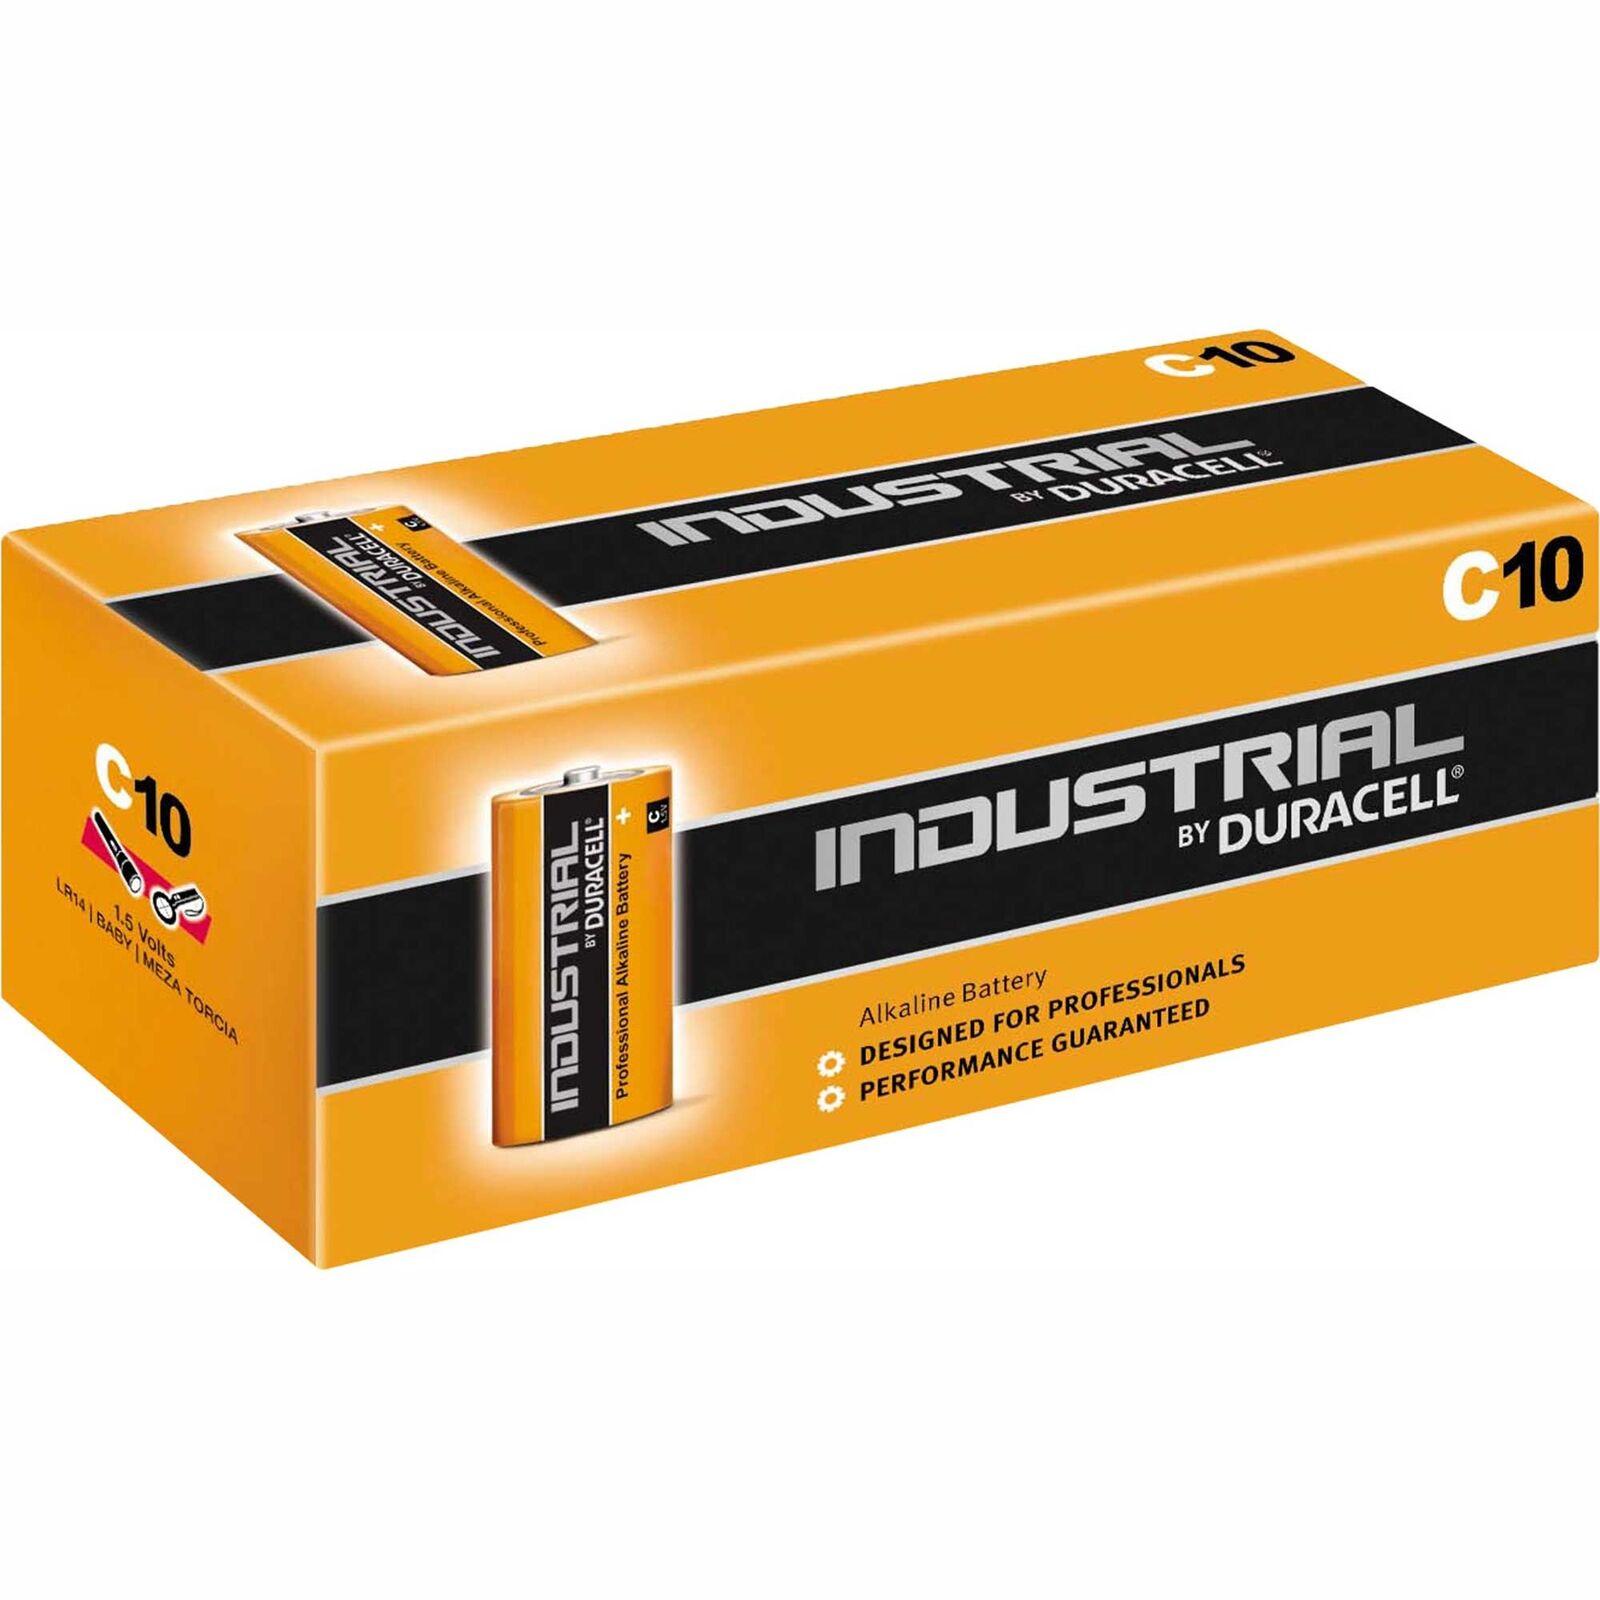 10 x Duracell Batteries Baby C lr14 mn1400 Alkaline 1.5v Industrial 10er Pack